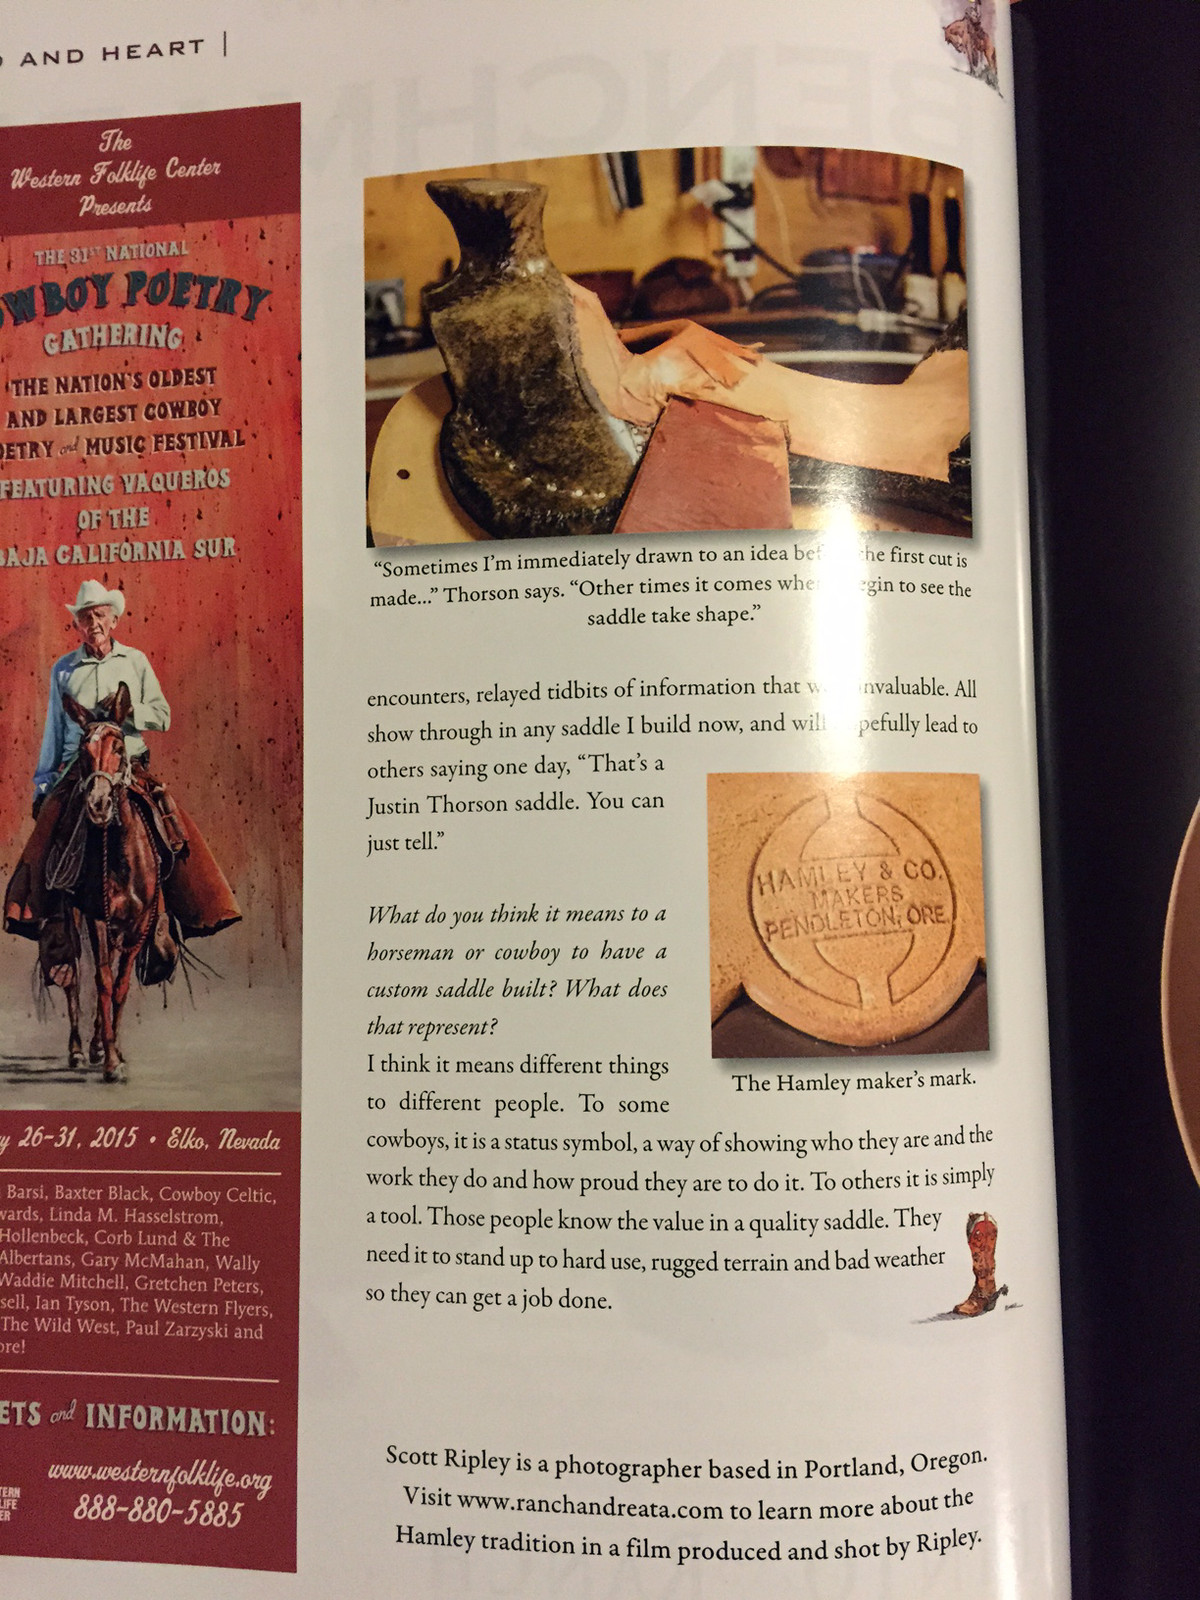 Justin Thorson Custom Saddles | About